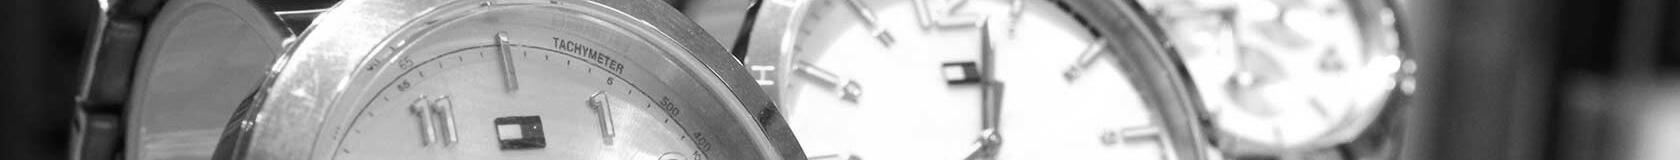 Afbeelding Horloges